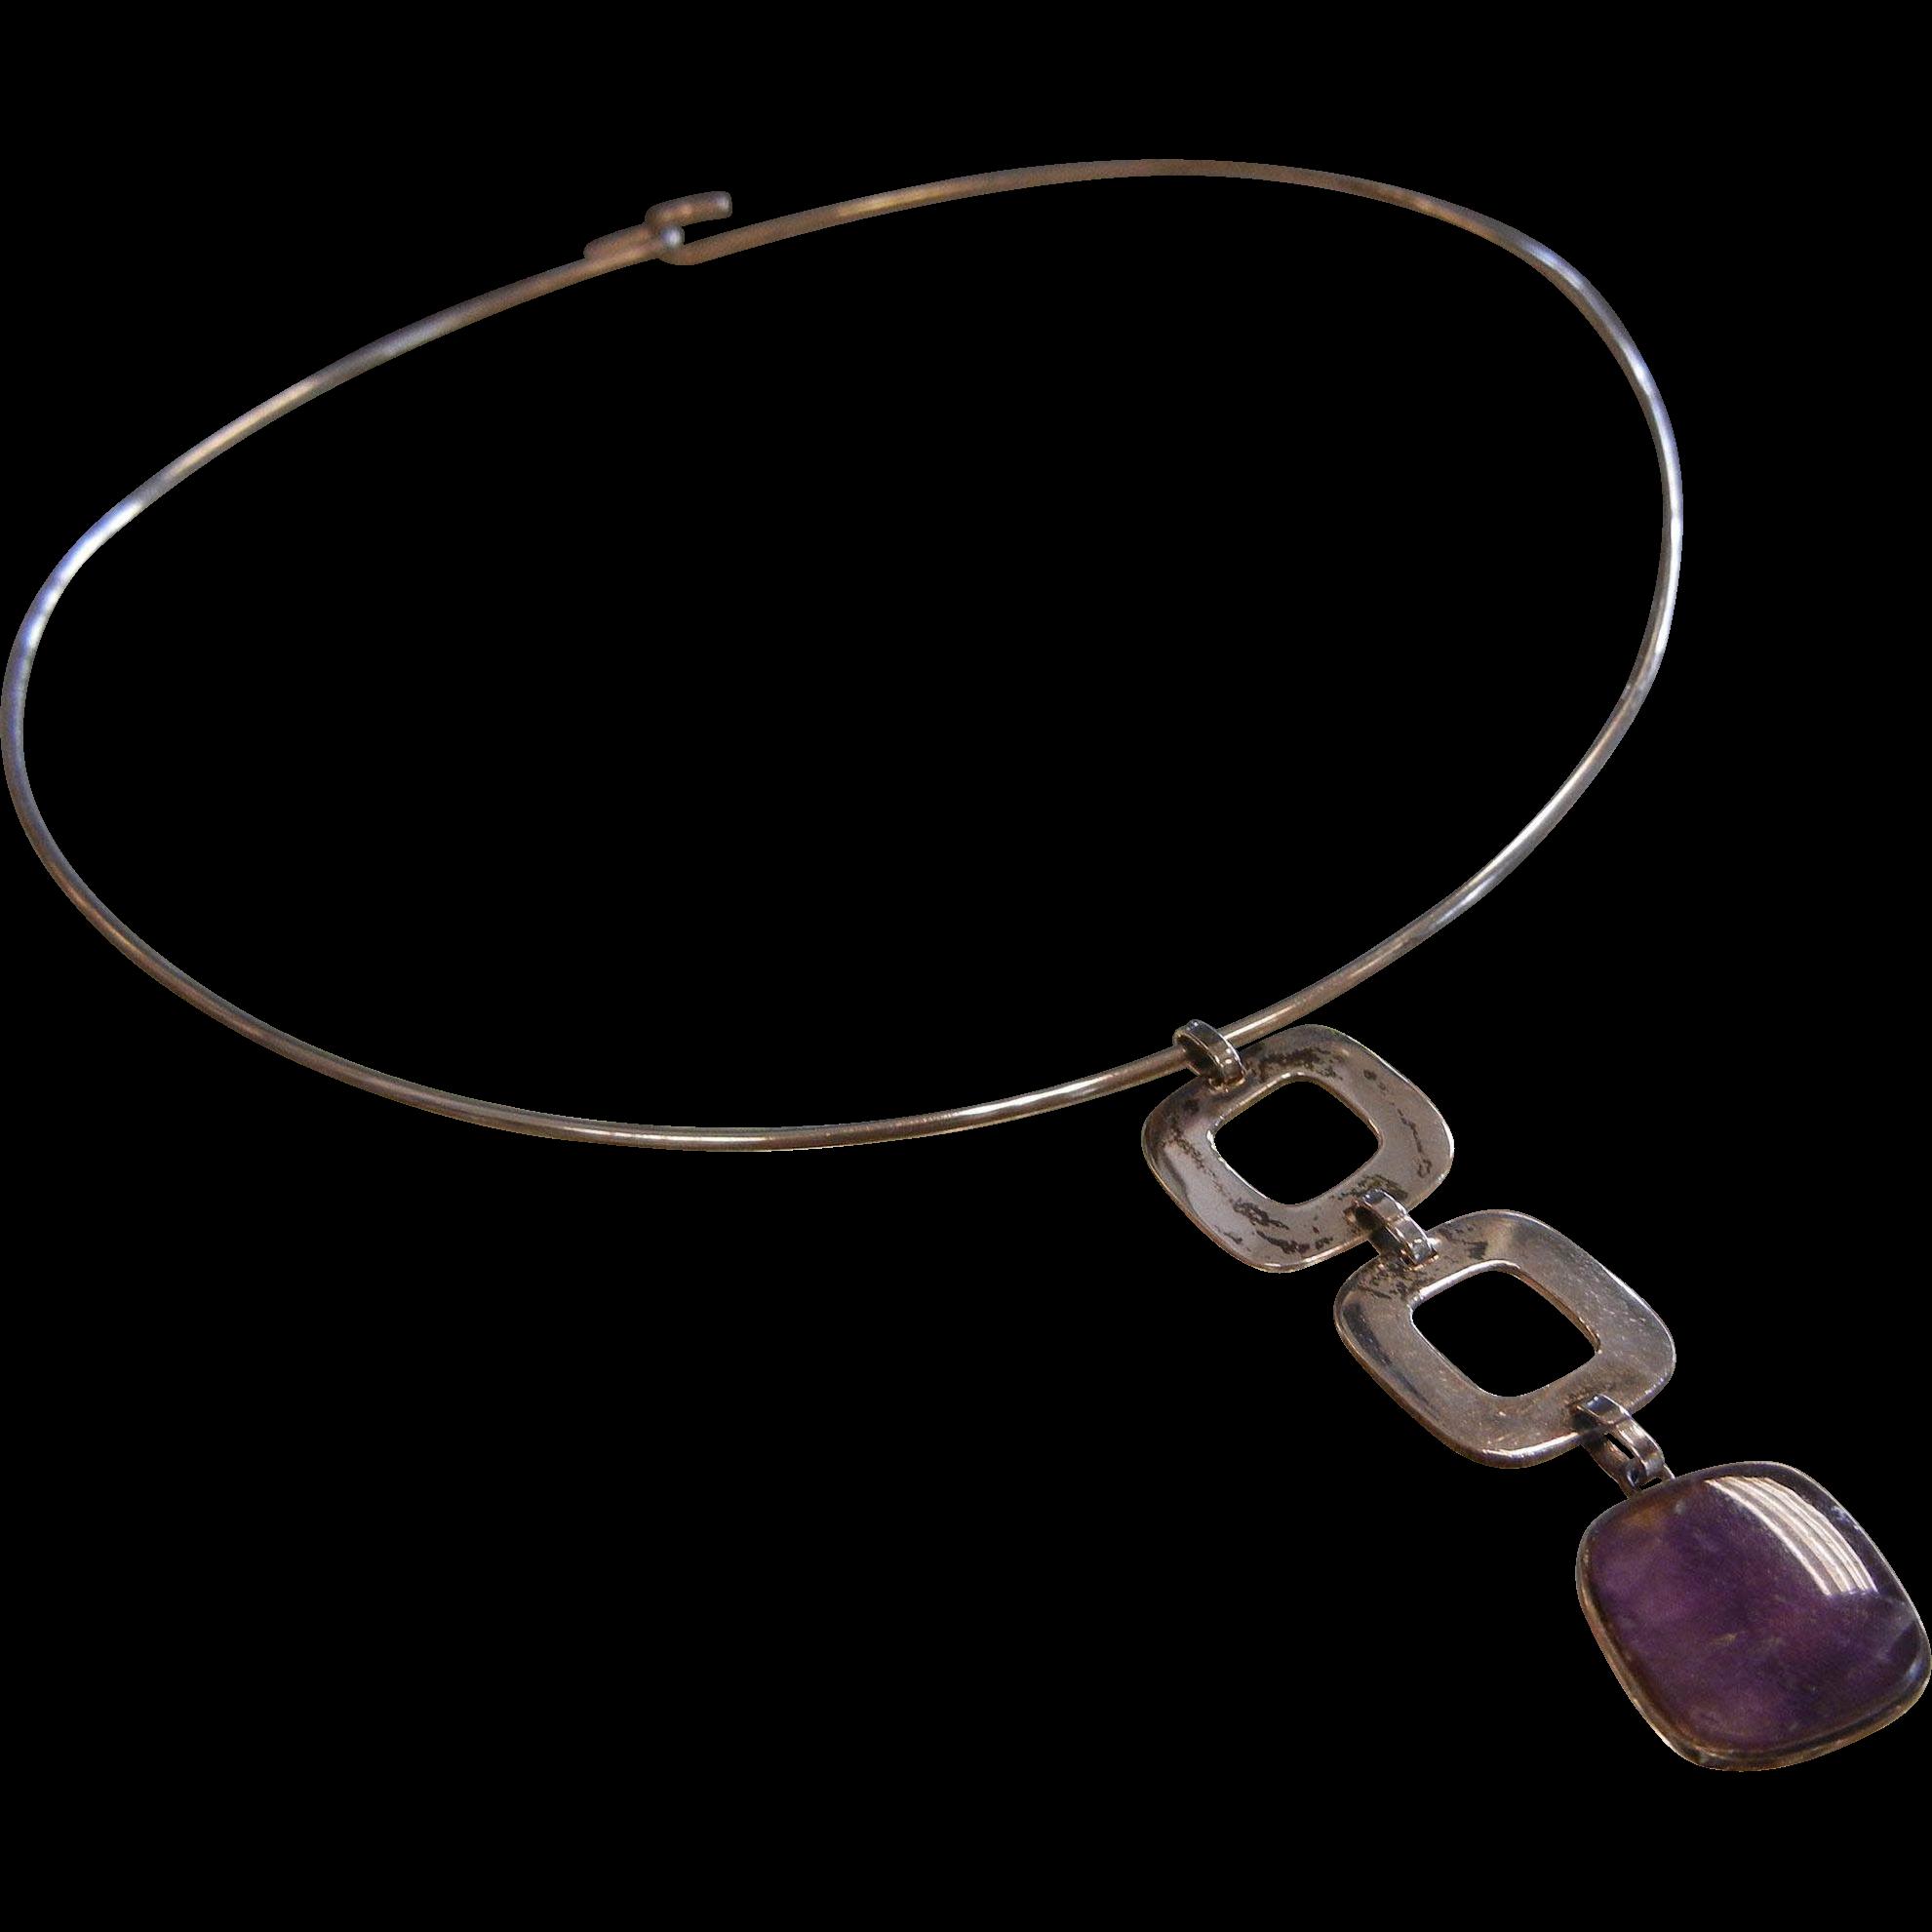 Vintage Finnland  Modernist Sterling Silver & Amethyst Pendant Neck Ring Signed H